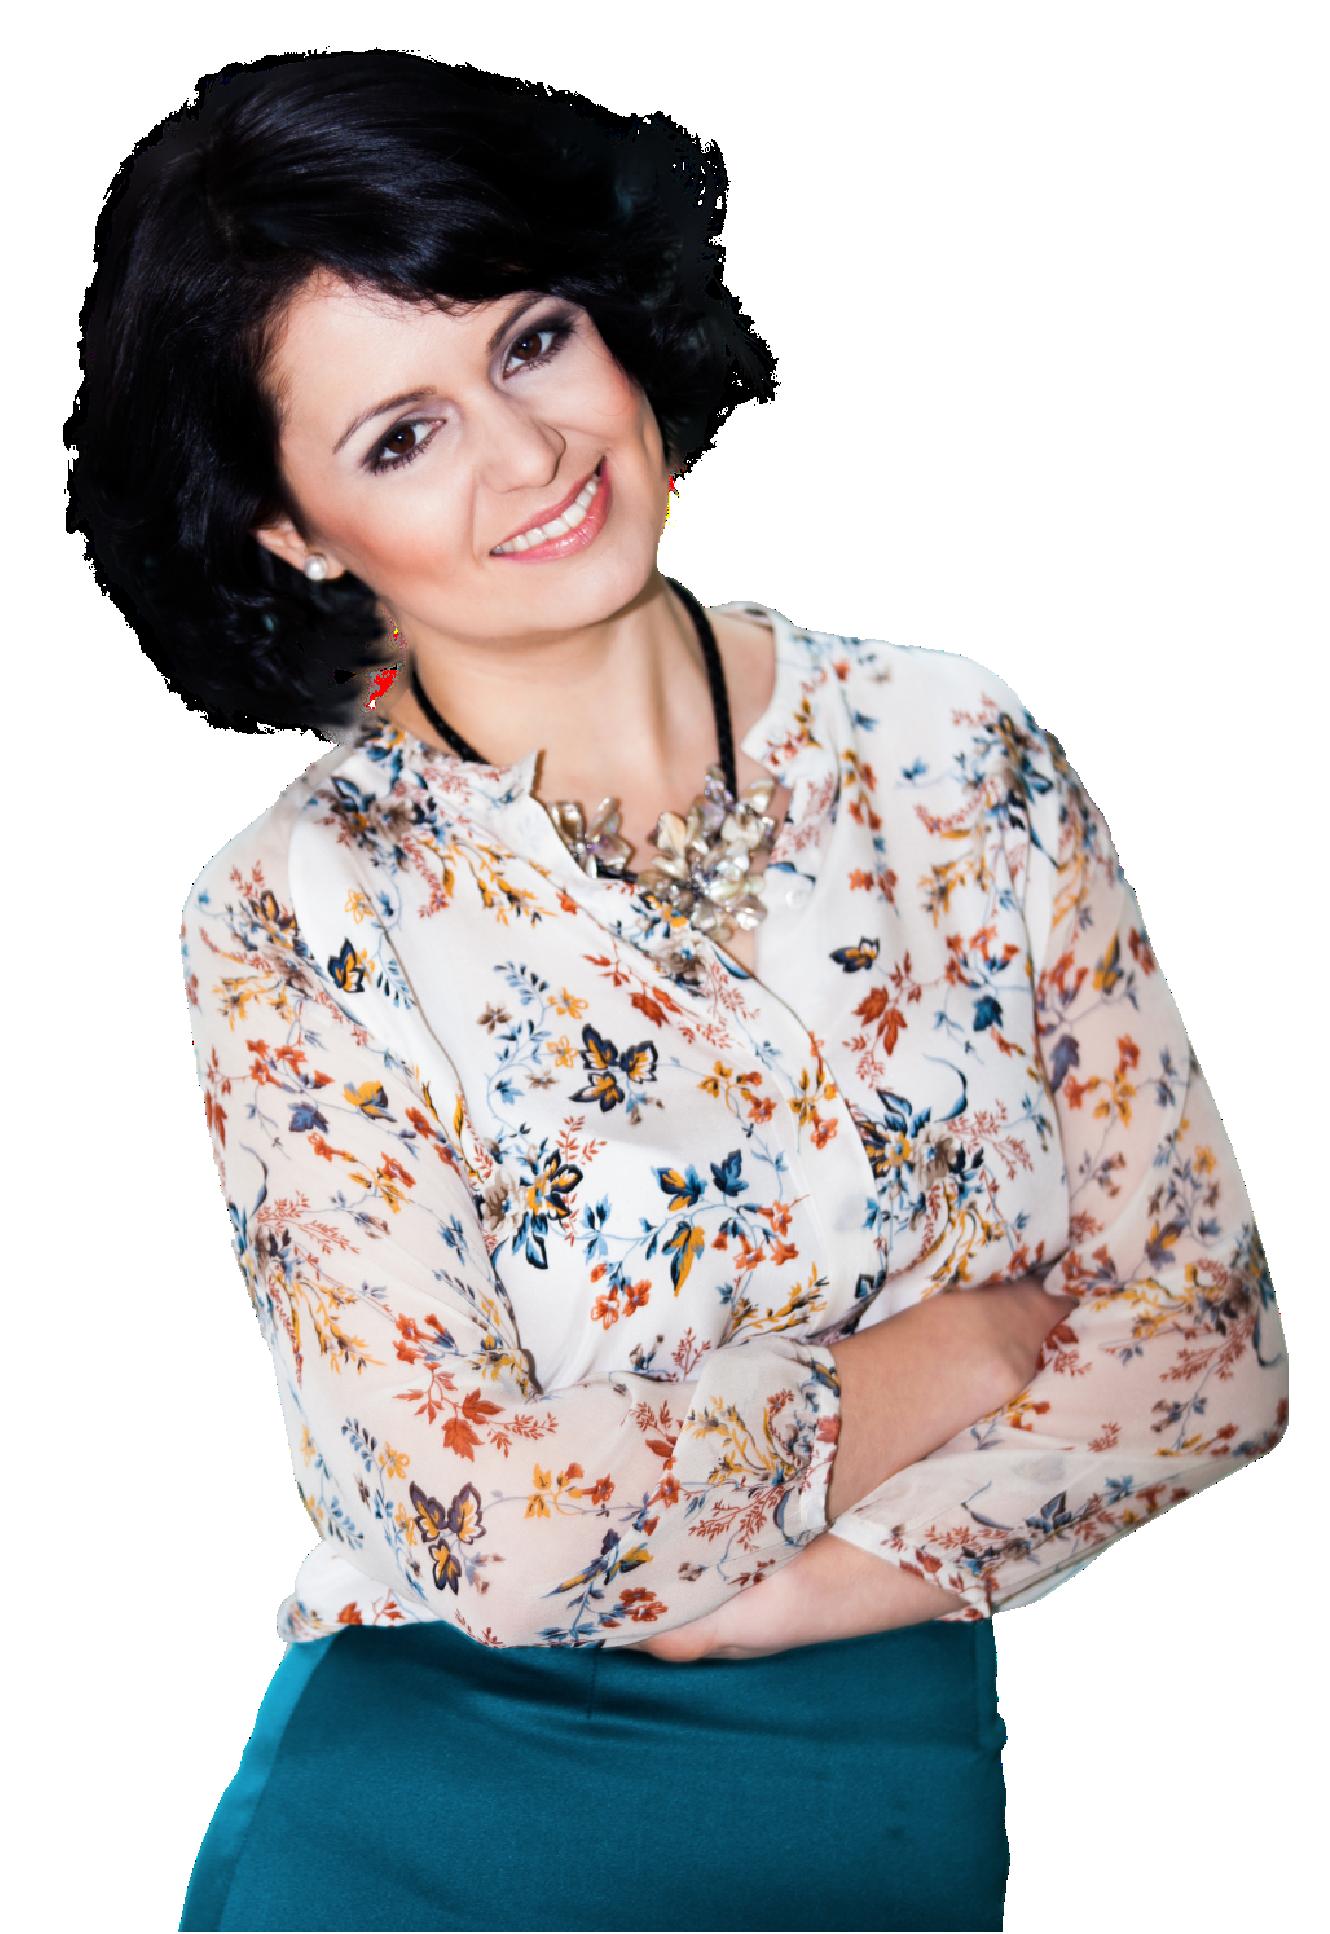 Diana-Founder FocalHive